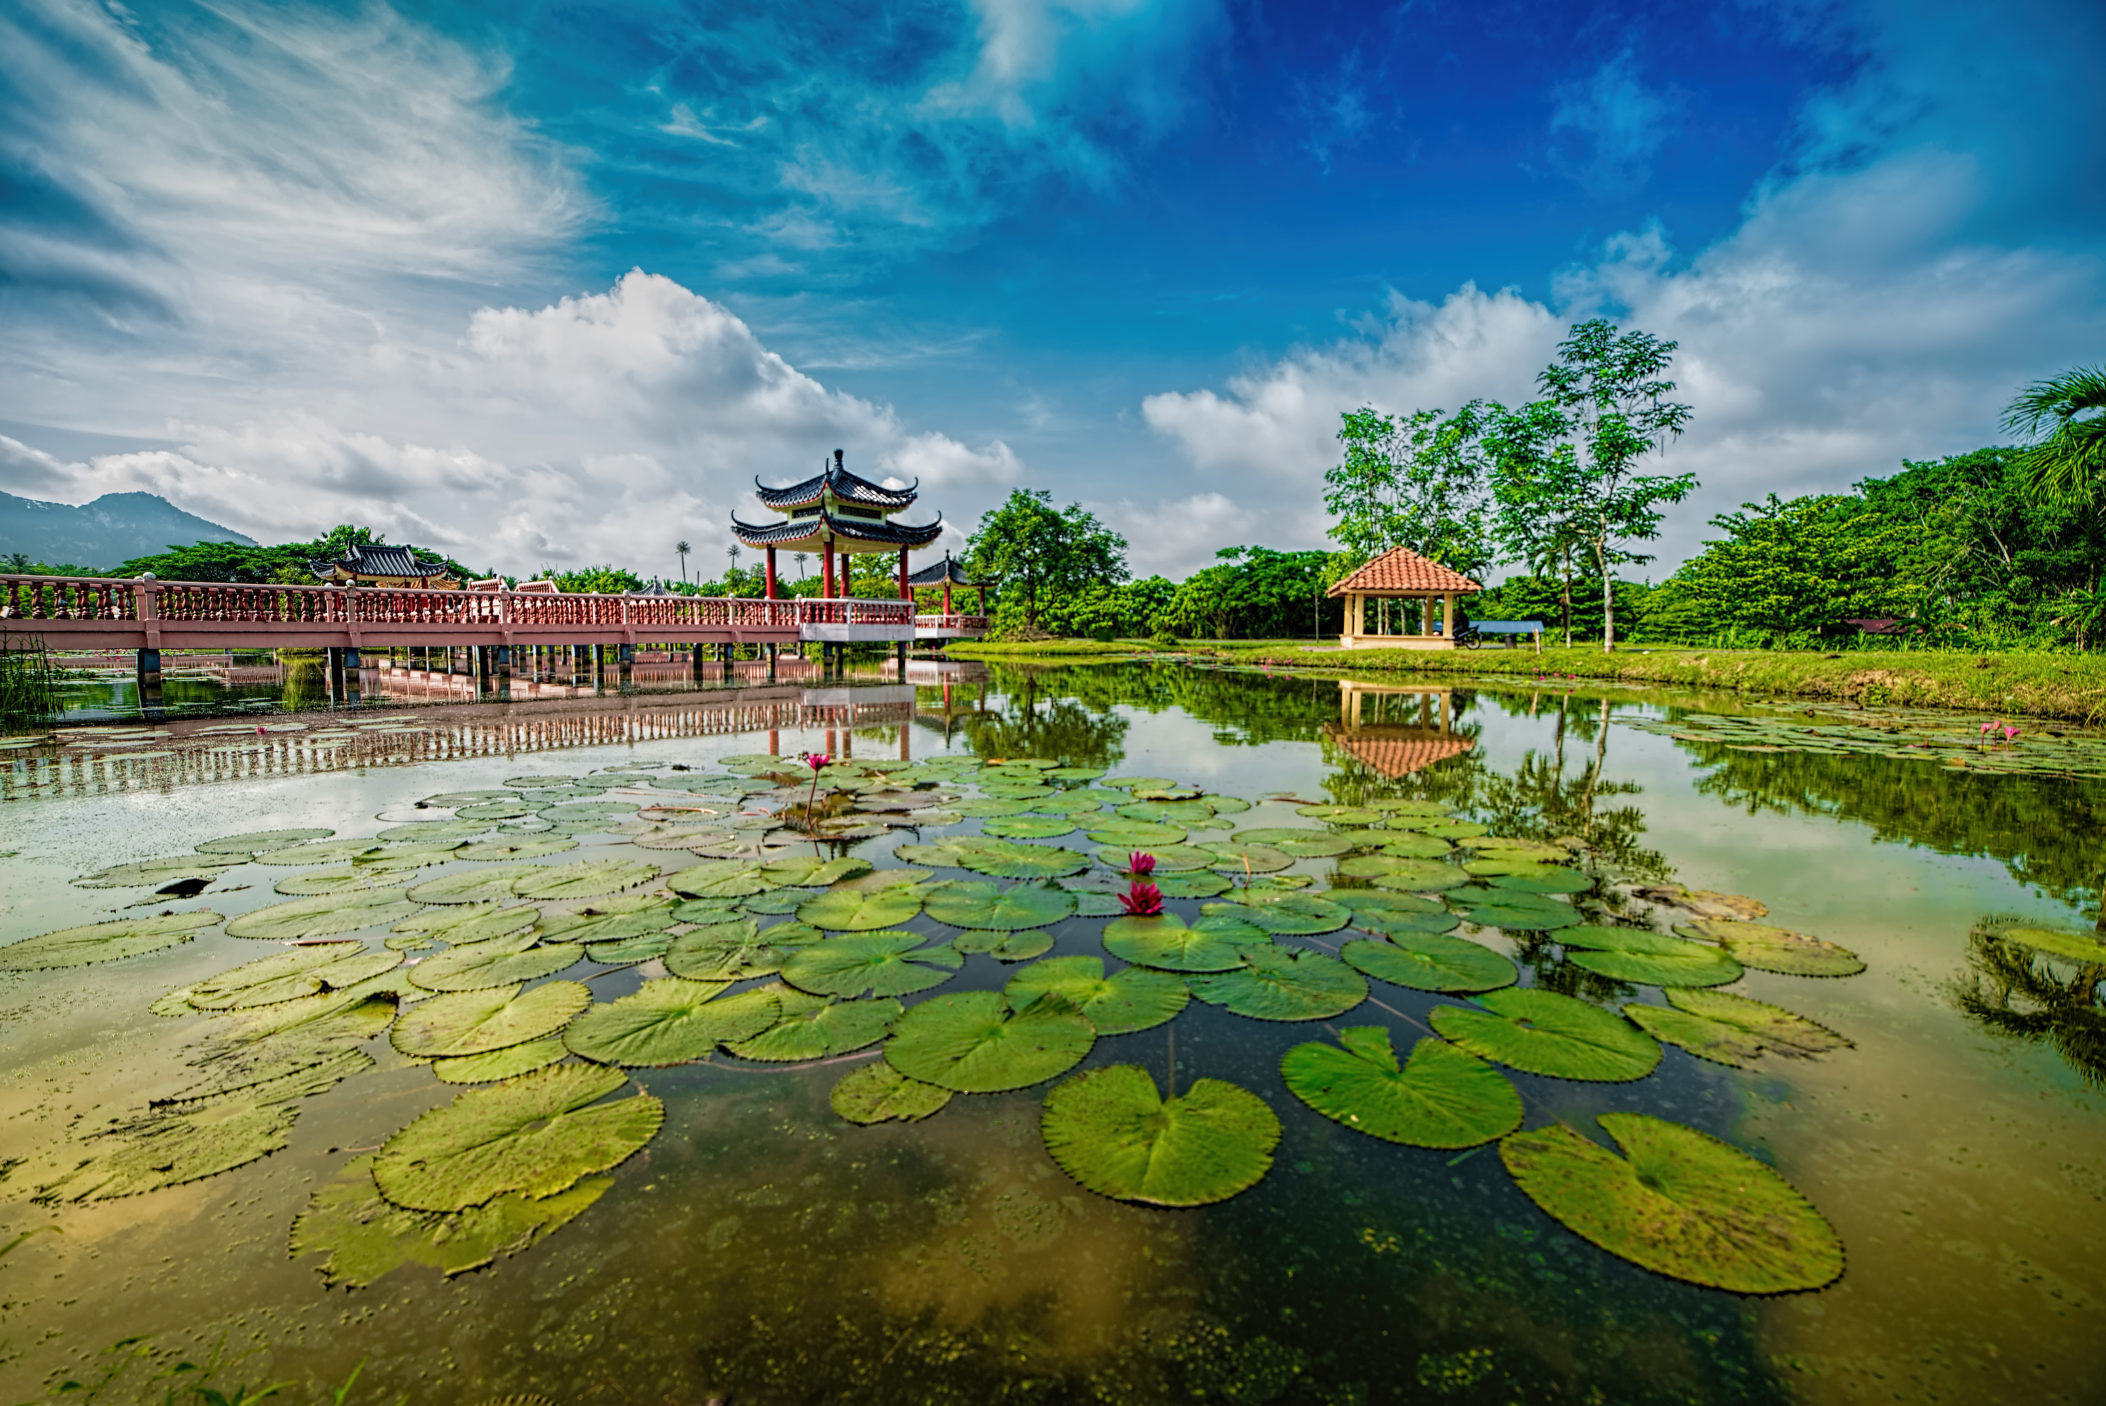 Malaysia [Shutterstock]